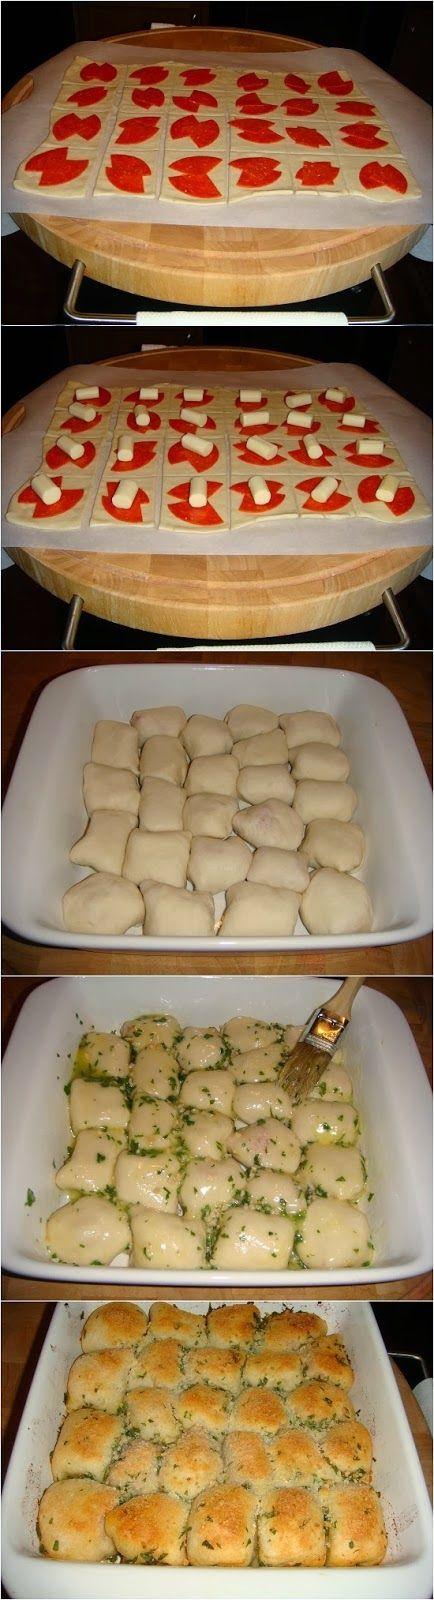 Stuffed Pizza Rolls - firstyum